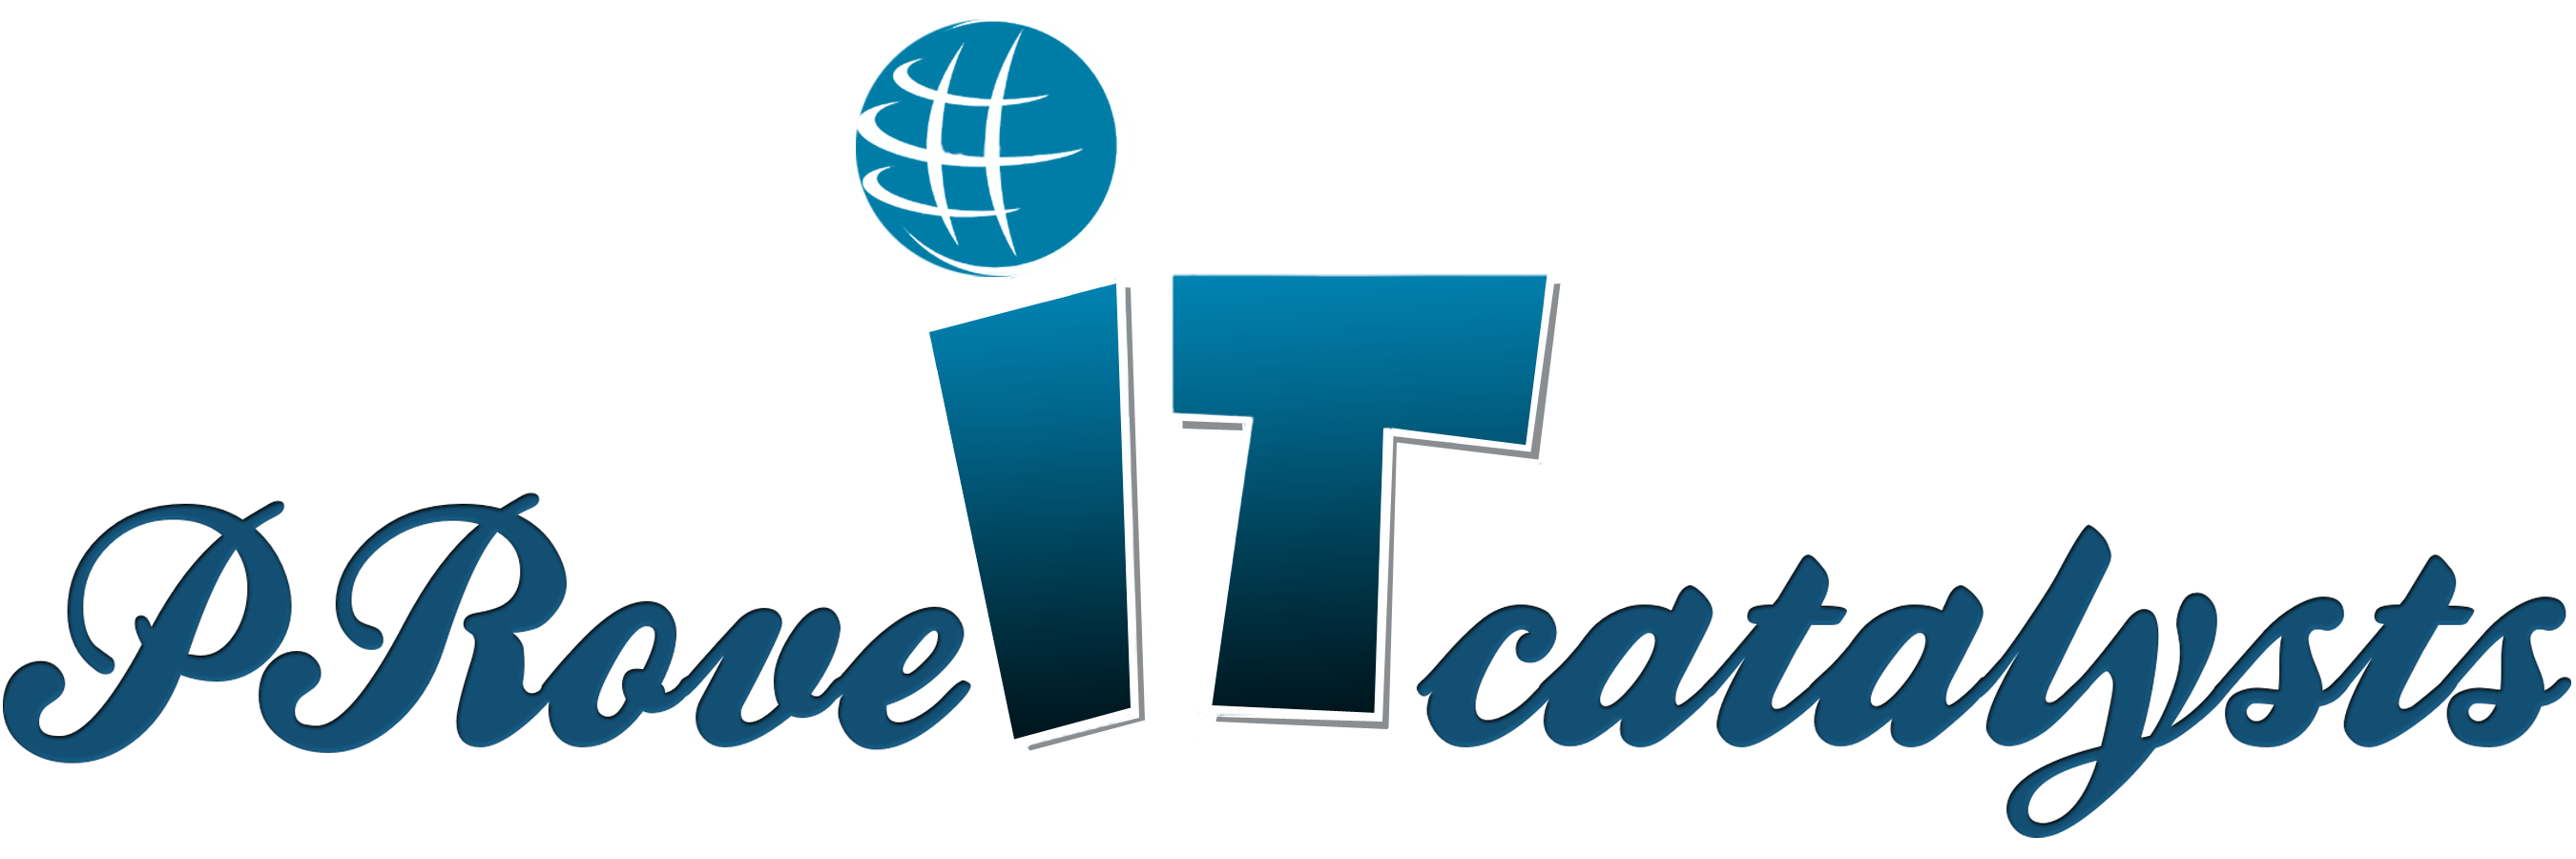 web development services in hyderabad